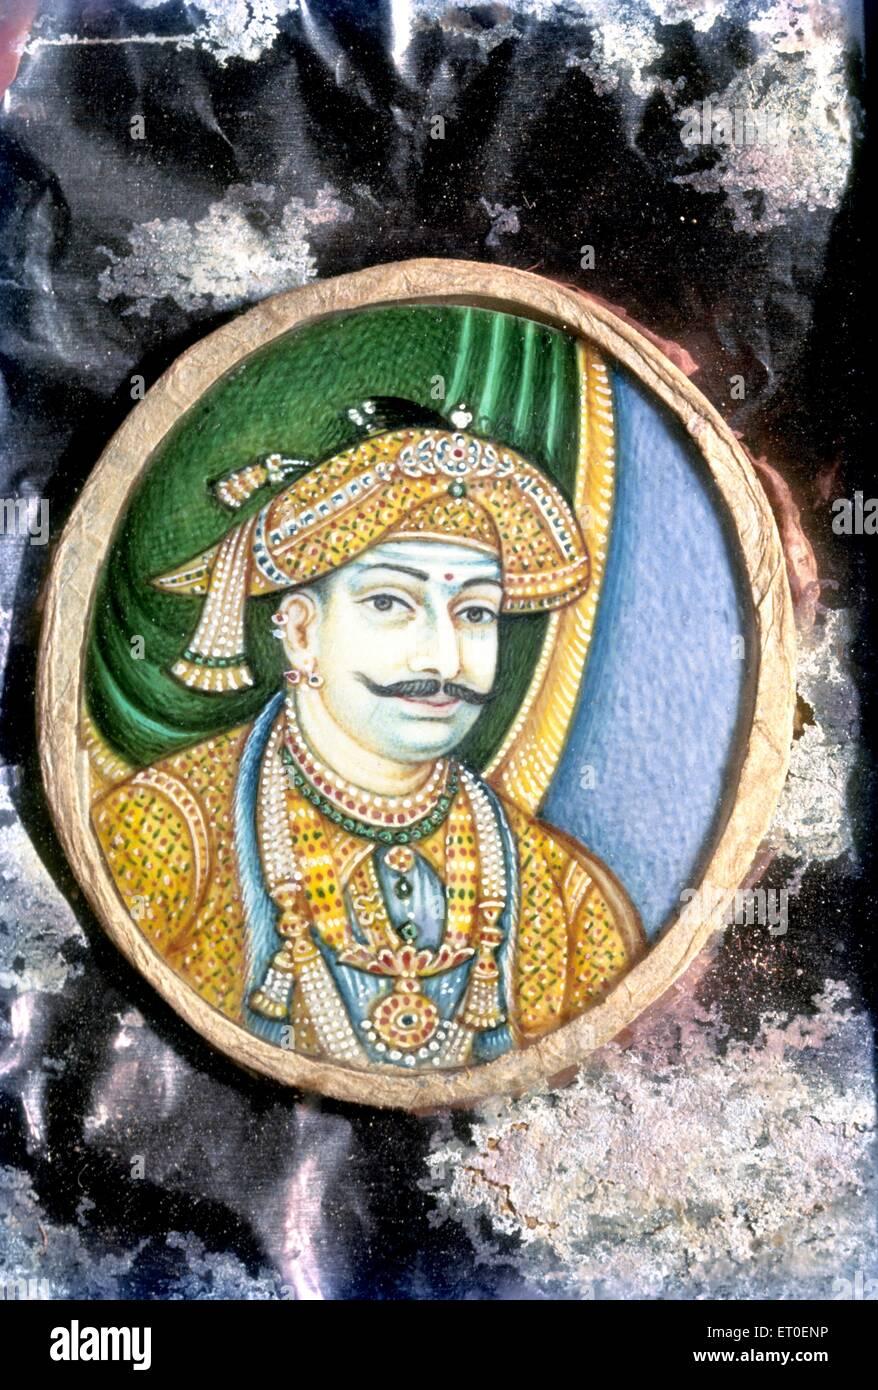 La pittura di shivaji II su avorio ;Tanjore ;Thanjavur ; Tamil Nadu ; India Immagini Stock